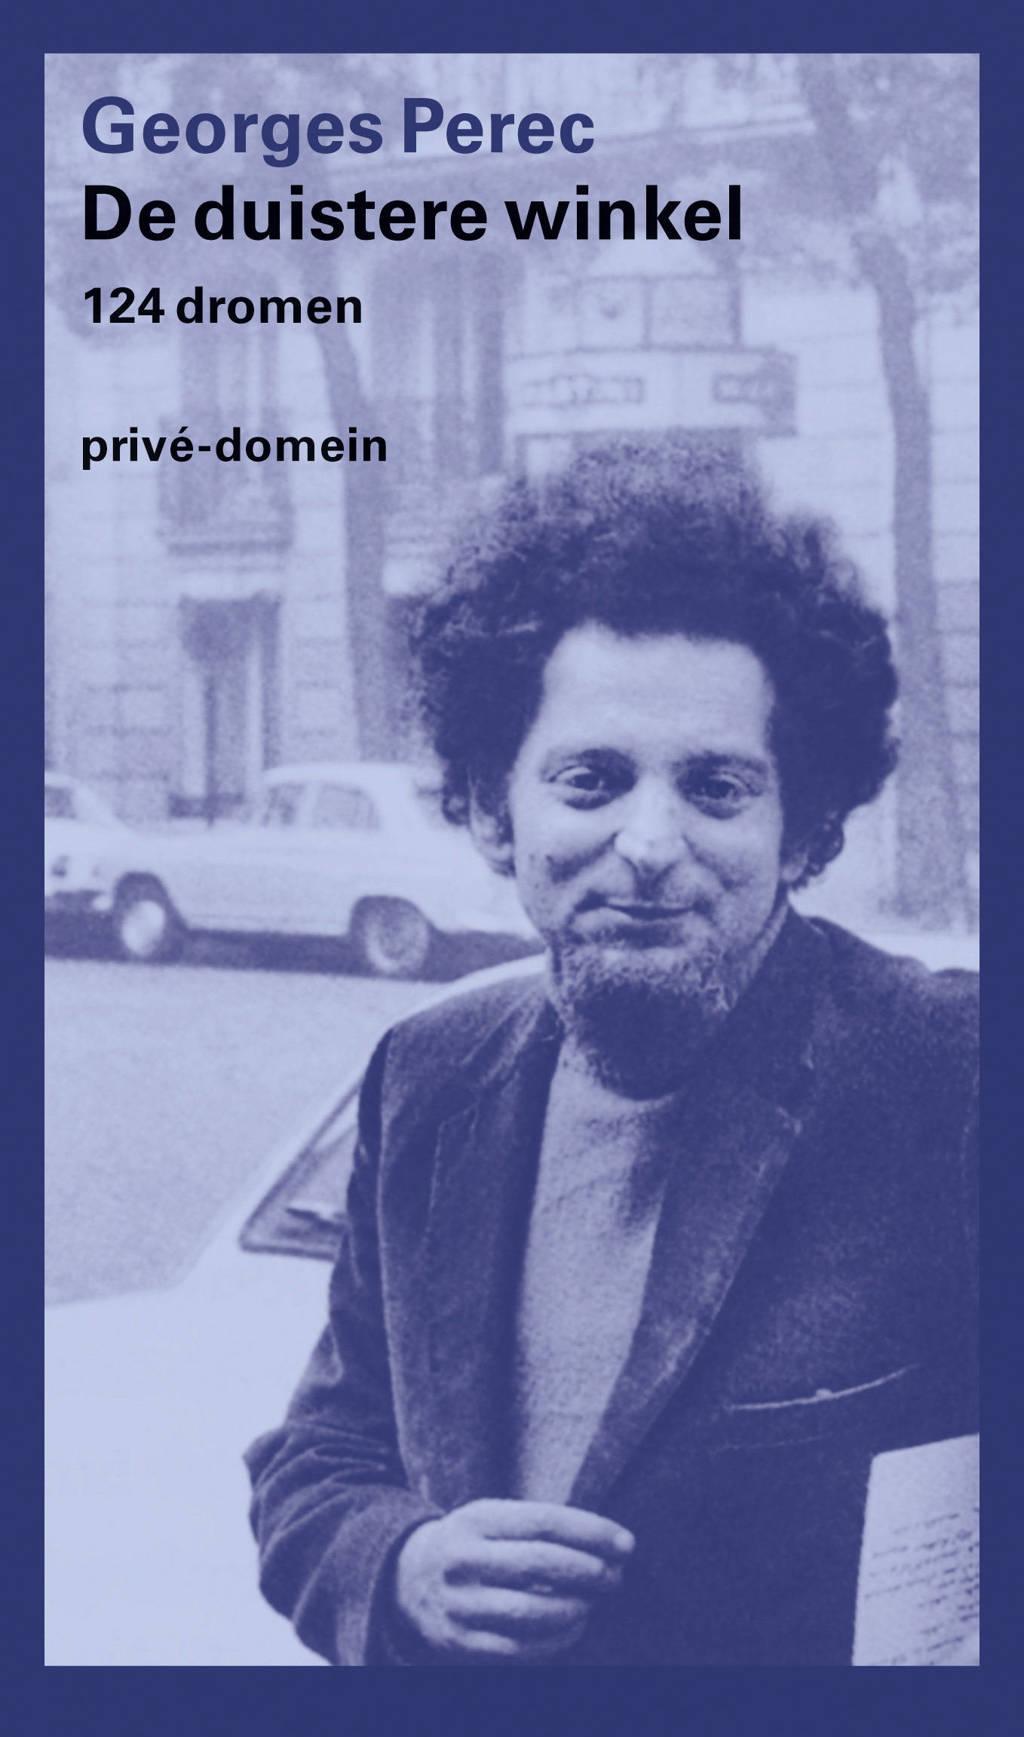 De duistere winkel - Georges Perec